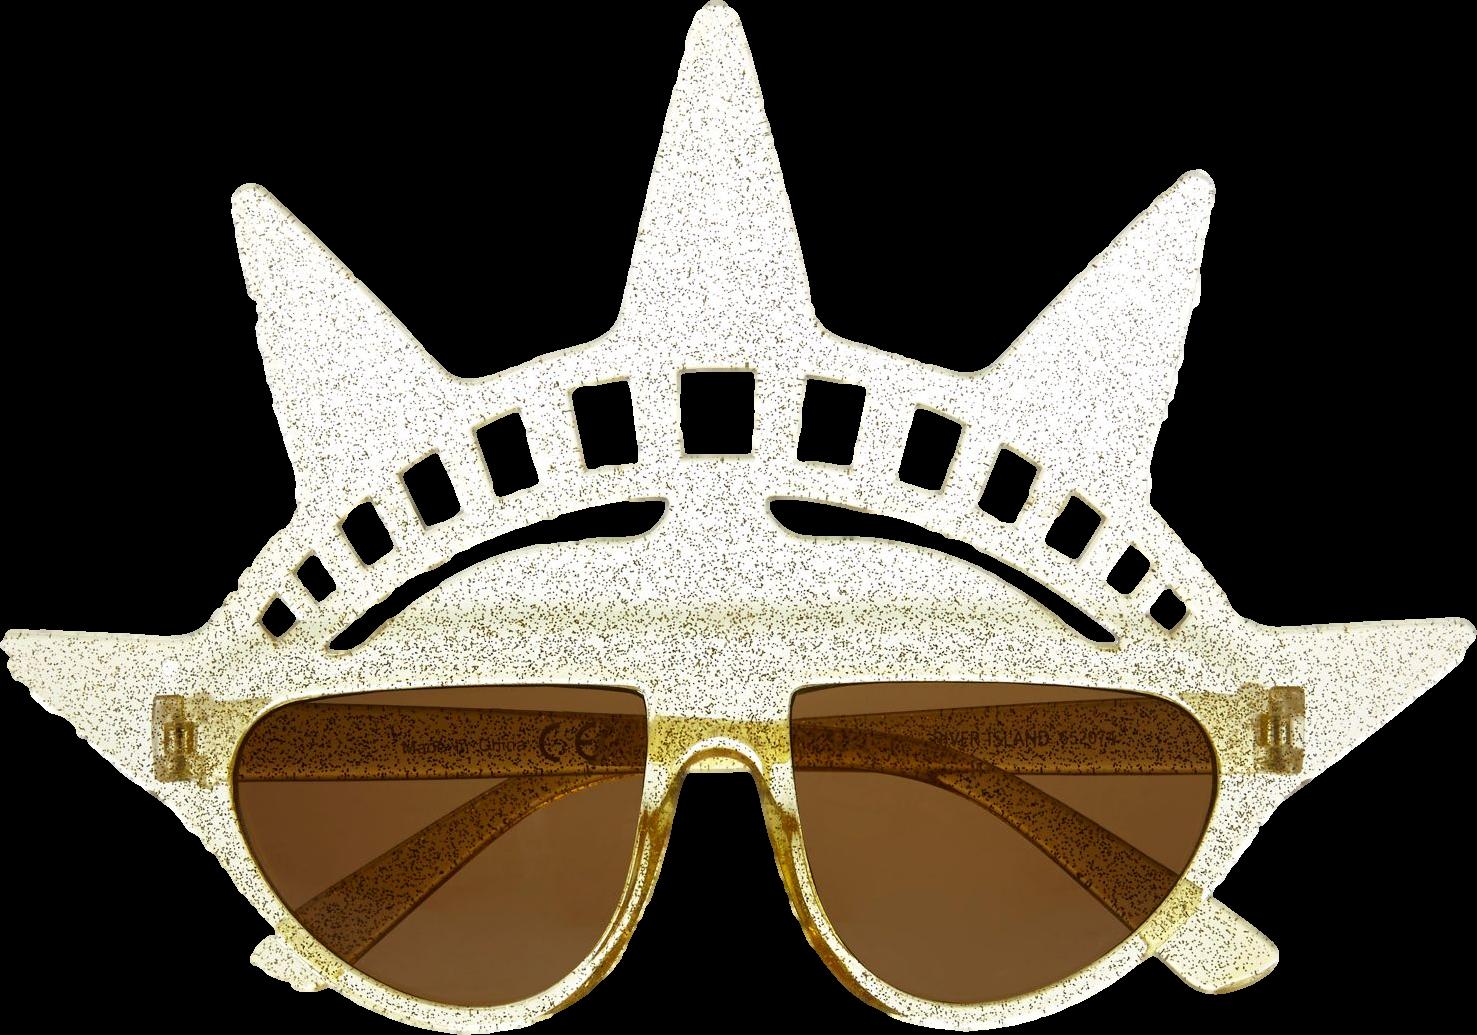 Gold Statue of Liberty sunglasses